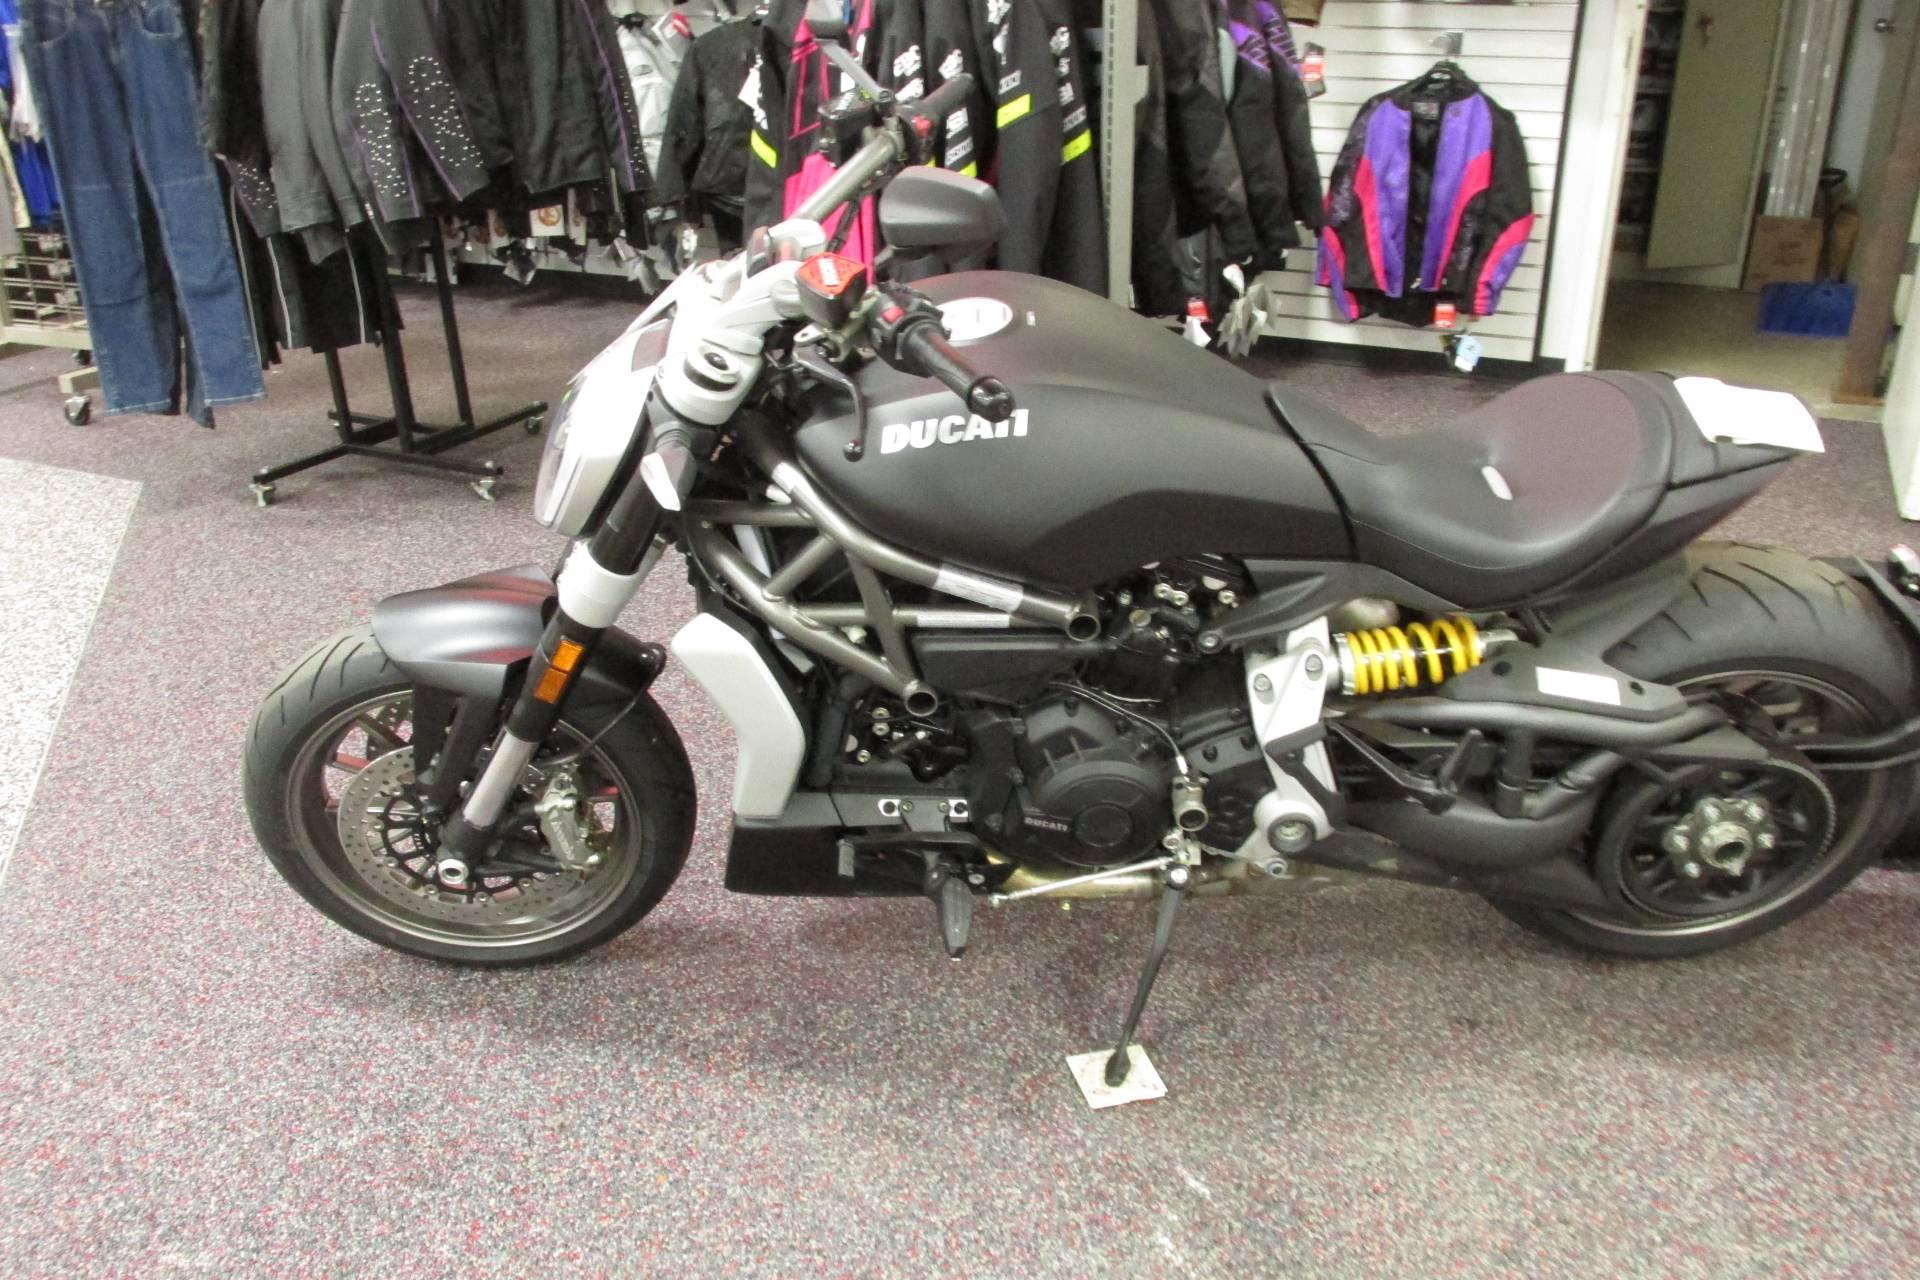 Ducati Dealer Springfield Ohio